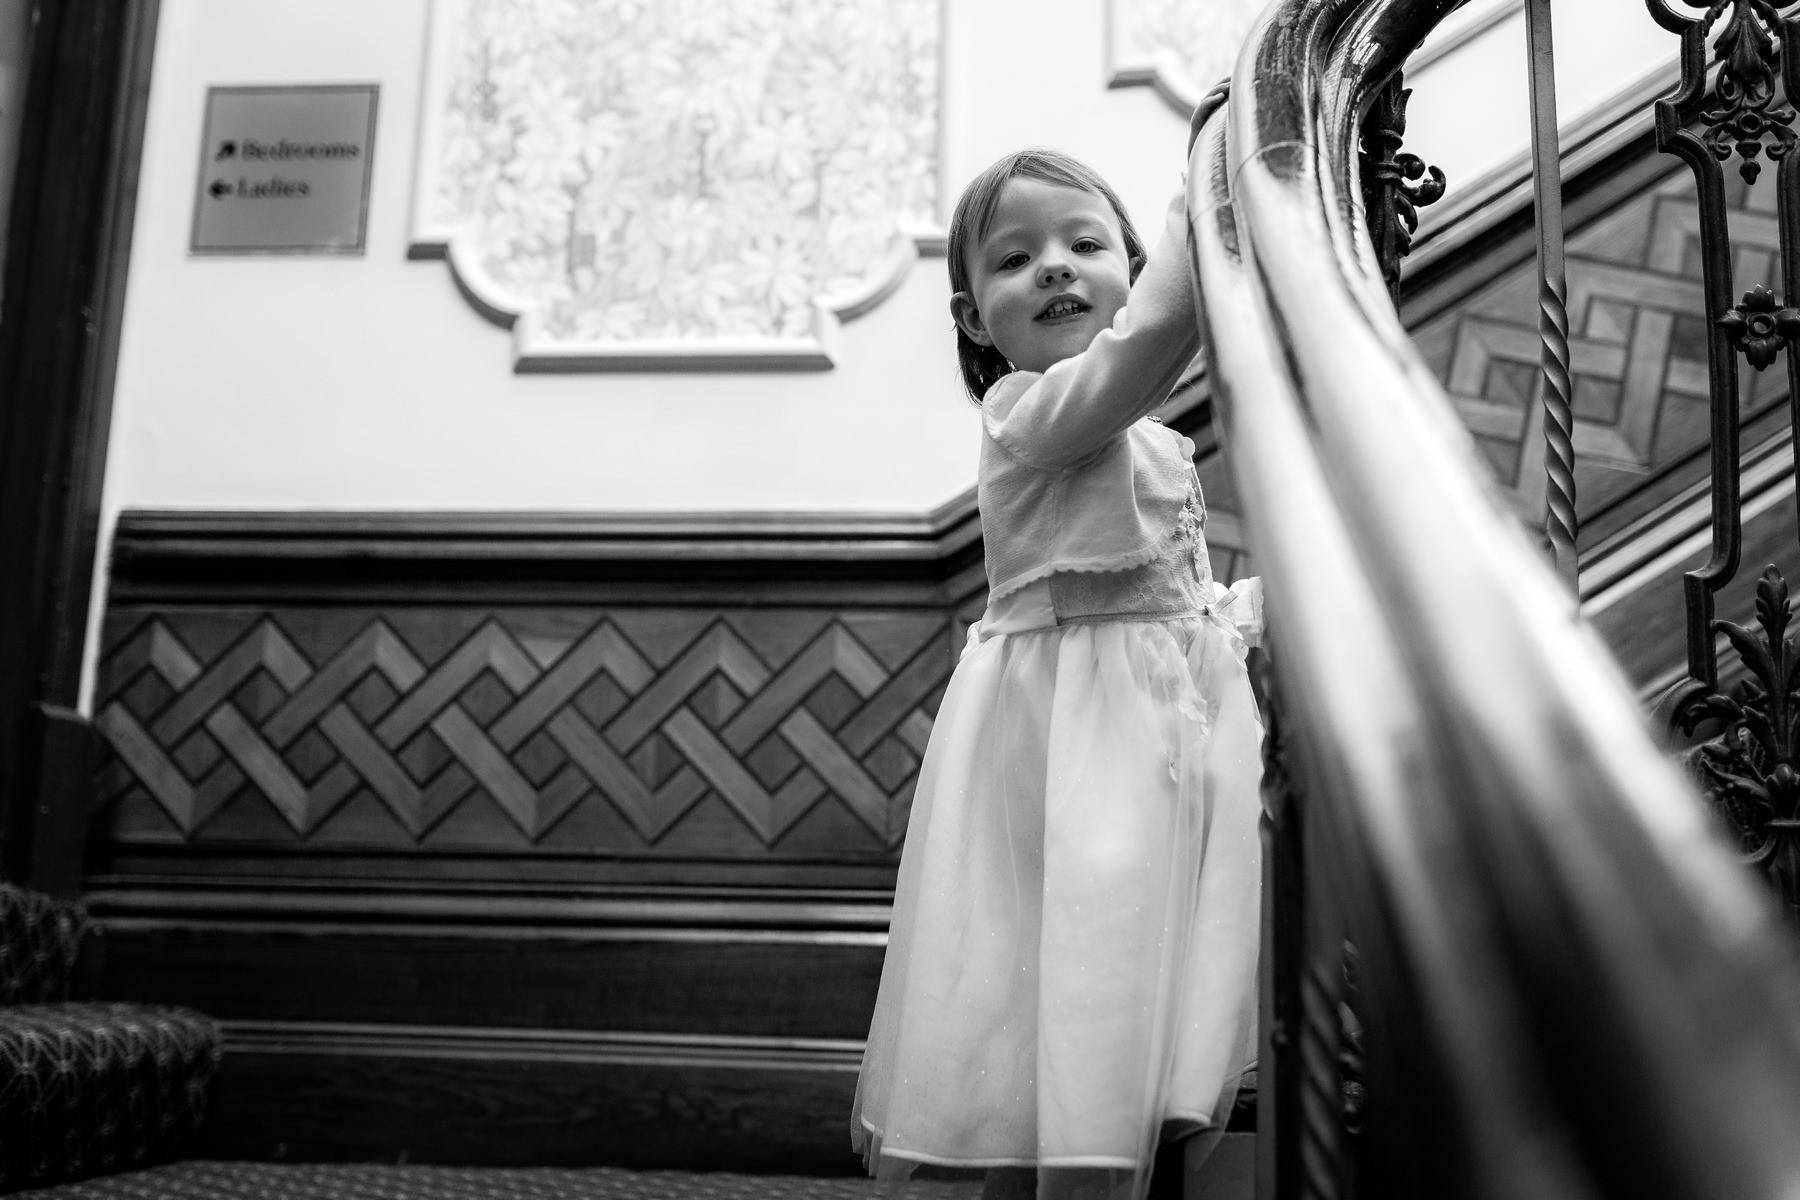 intimate-wedding-at-kilhey-court-lancashire-photographer_0024.jpg